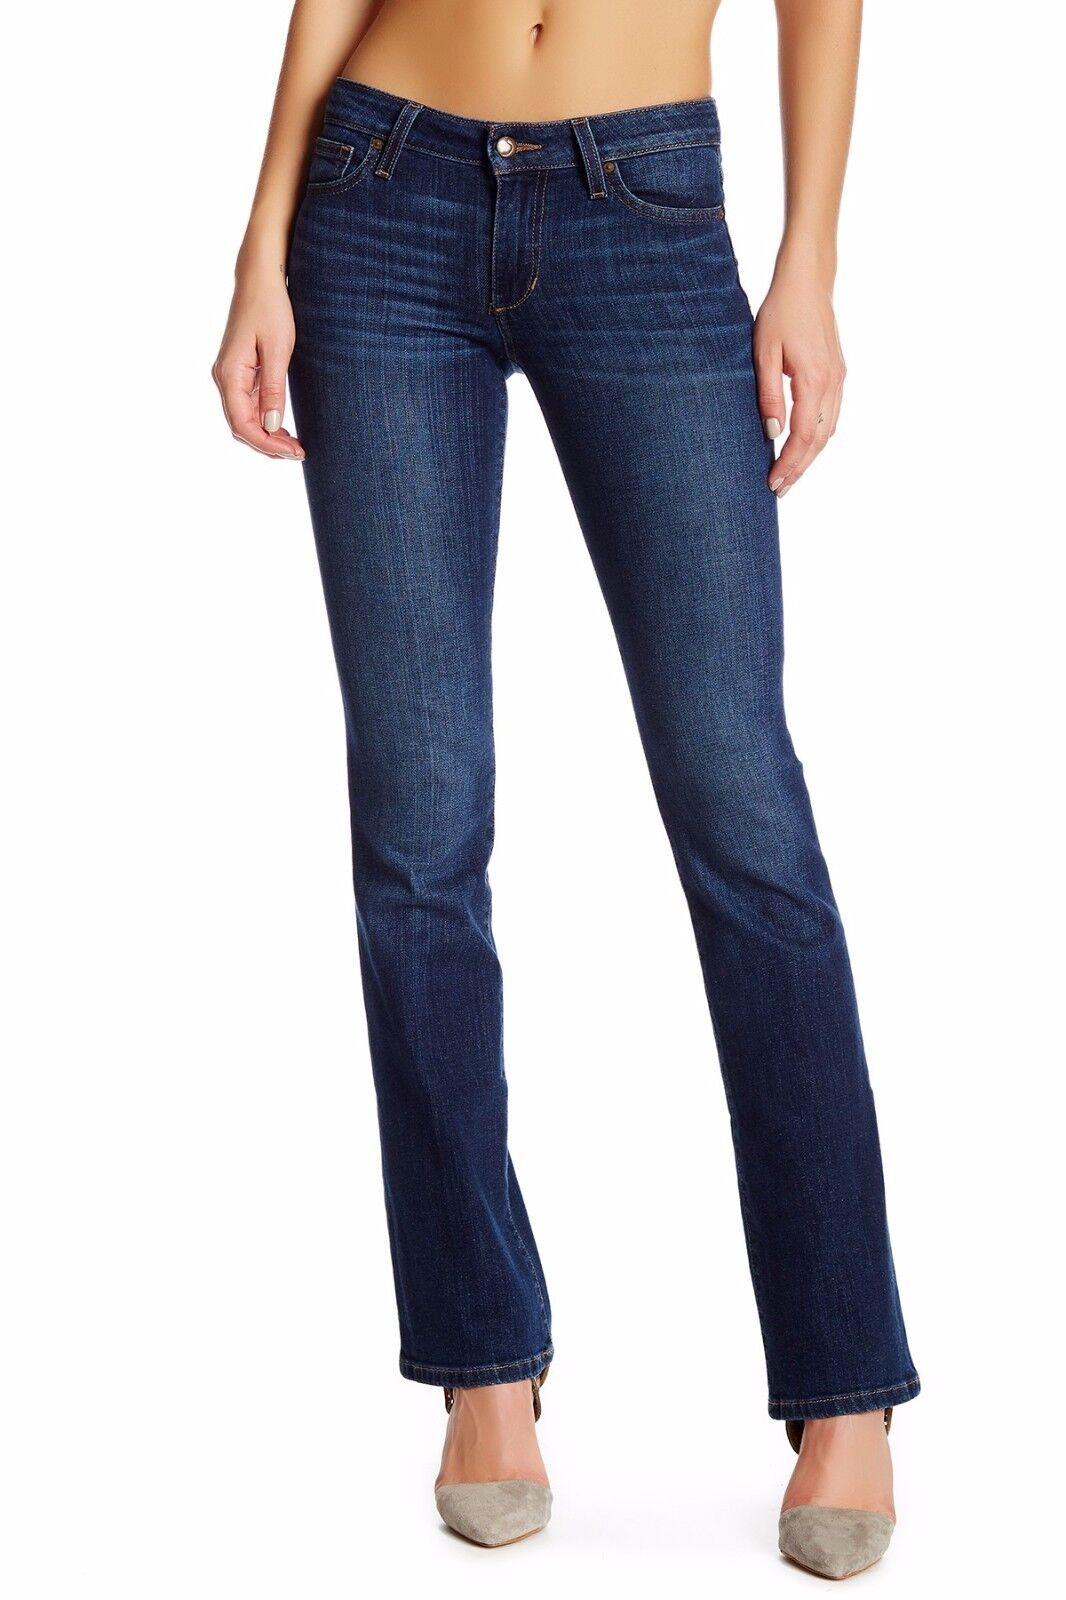 Joe's Jeans The Honey Curvy Bootcut Stretch Denim Pant Olympia 25 26 27 Nwt